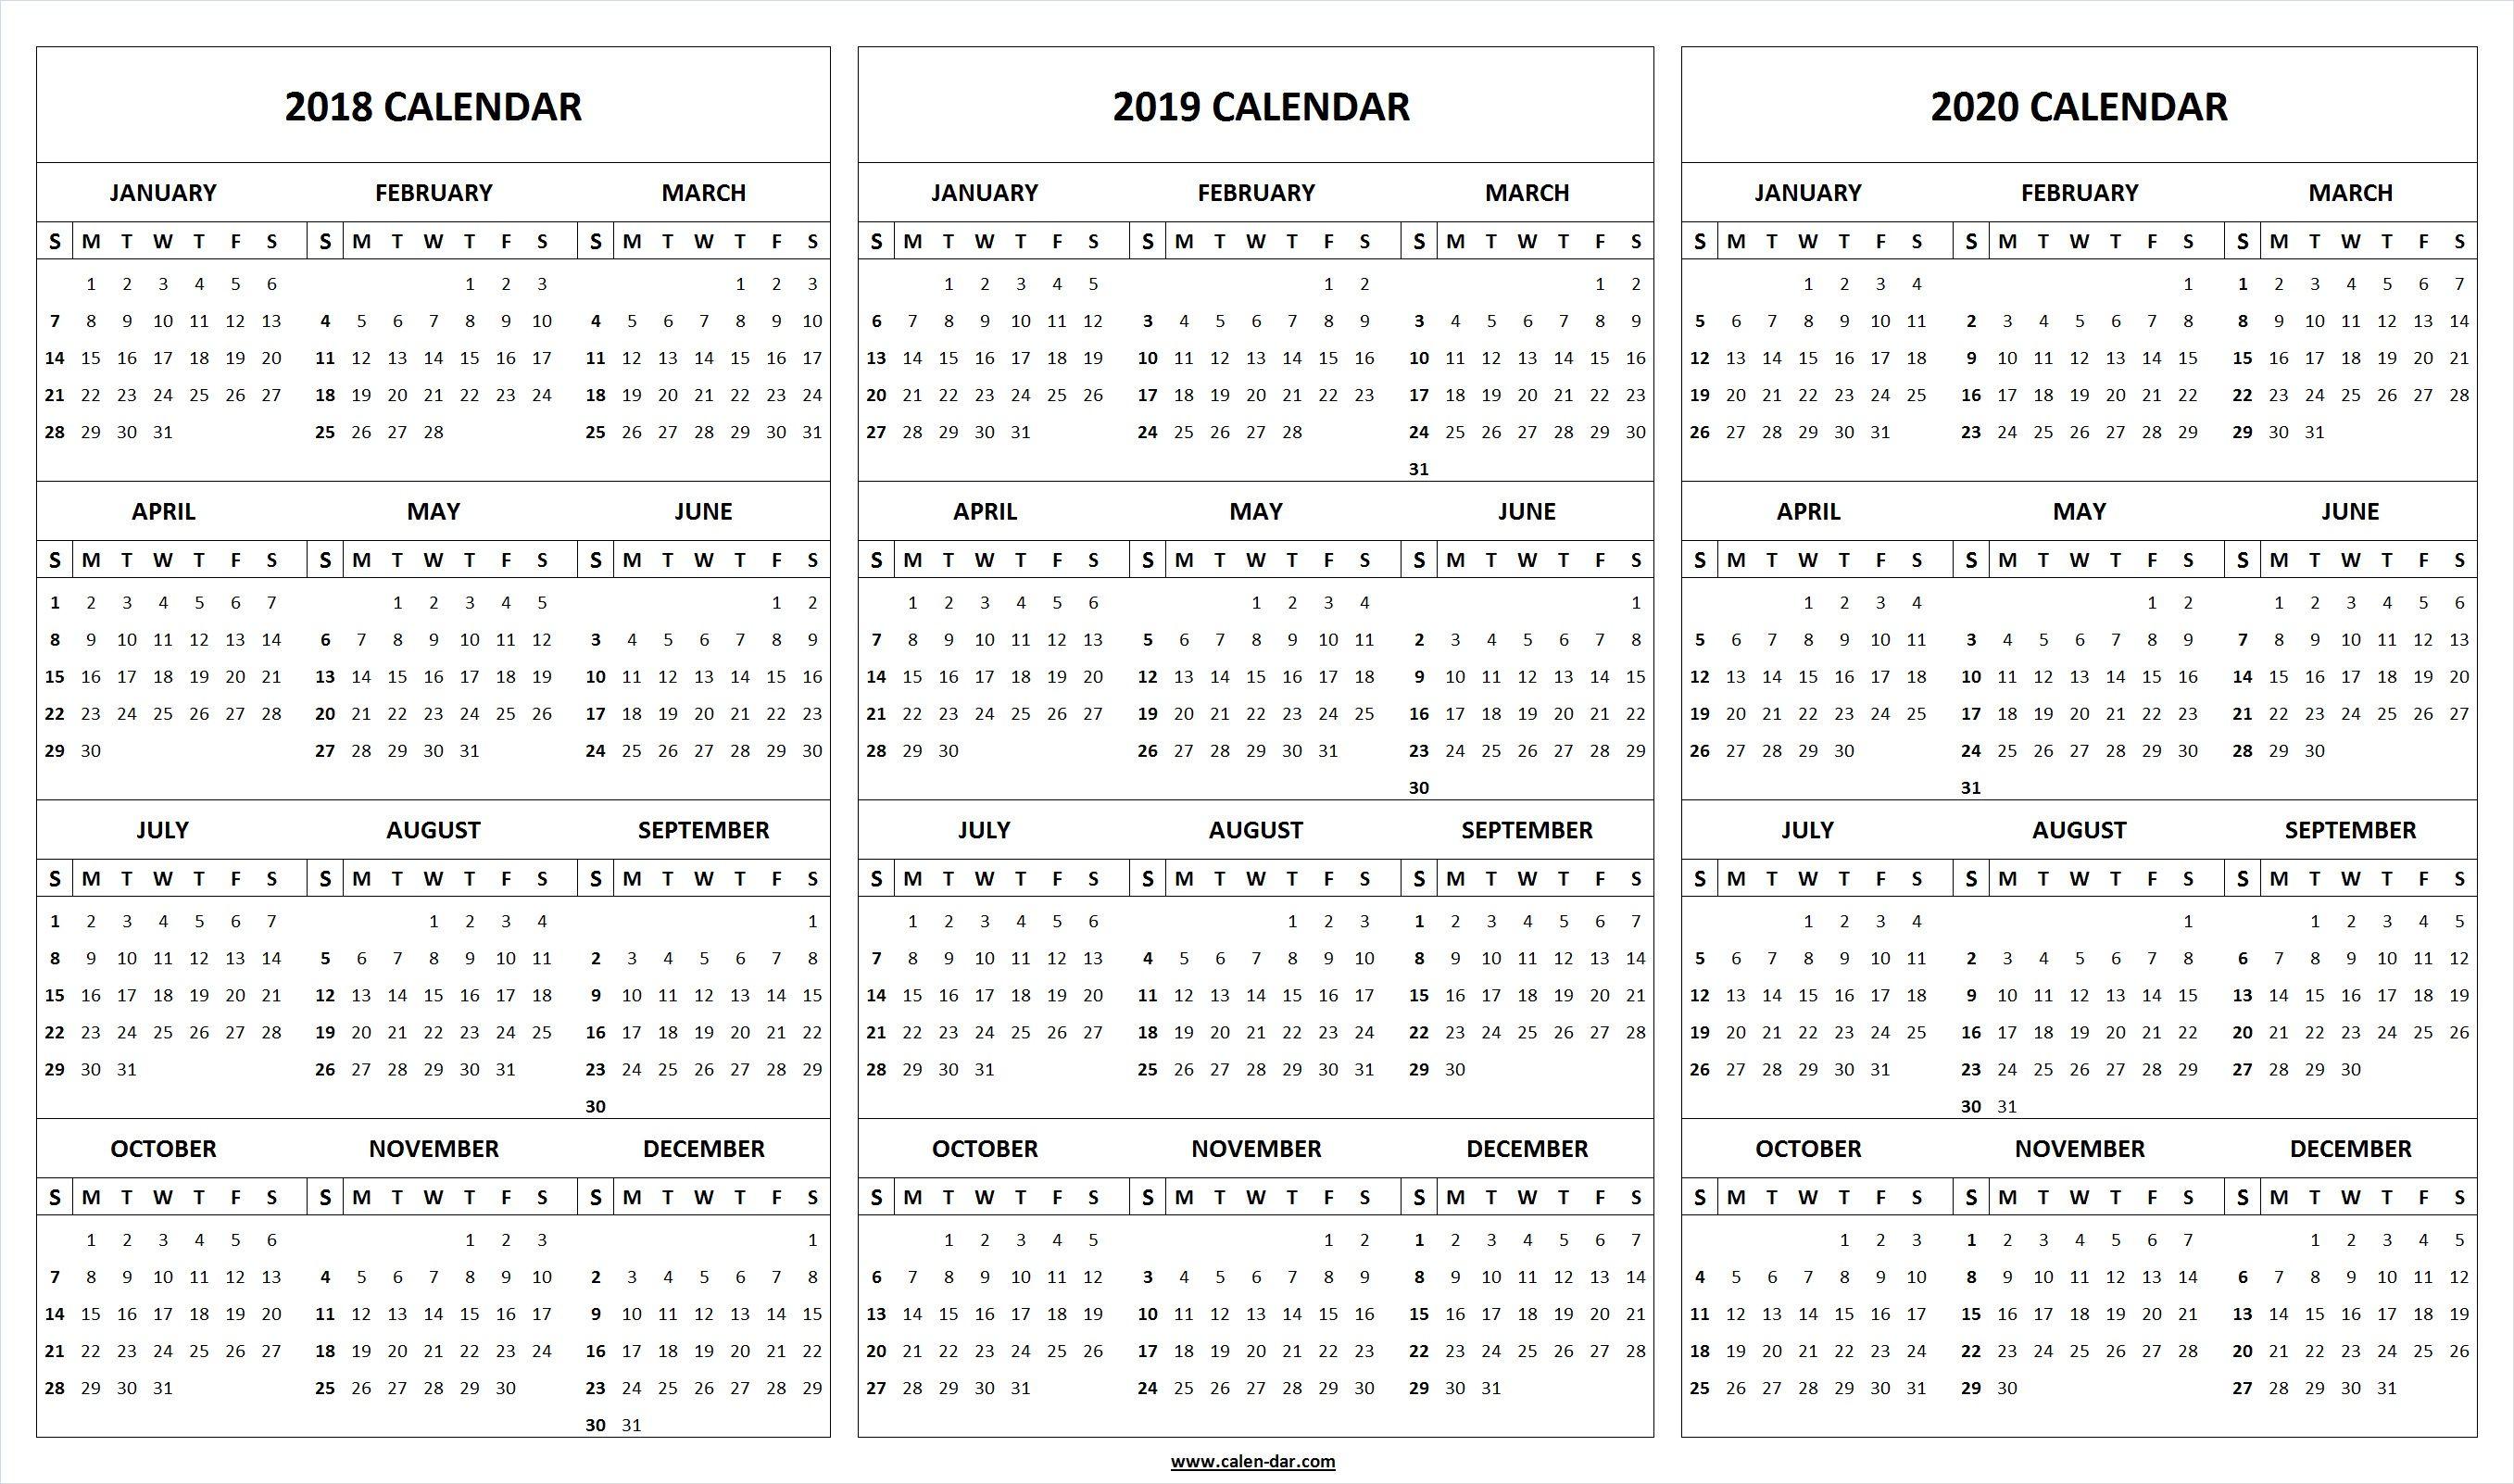 Print Blank 2018 2019 2020 Calendar Template | Organize! | 2019 with regard to 2019-2020 Blank Calendar To Print